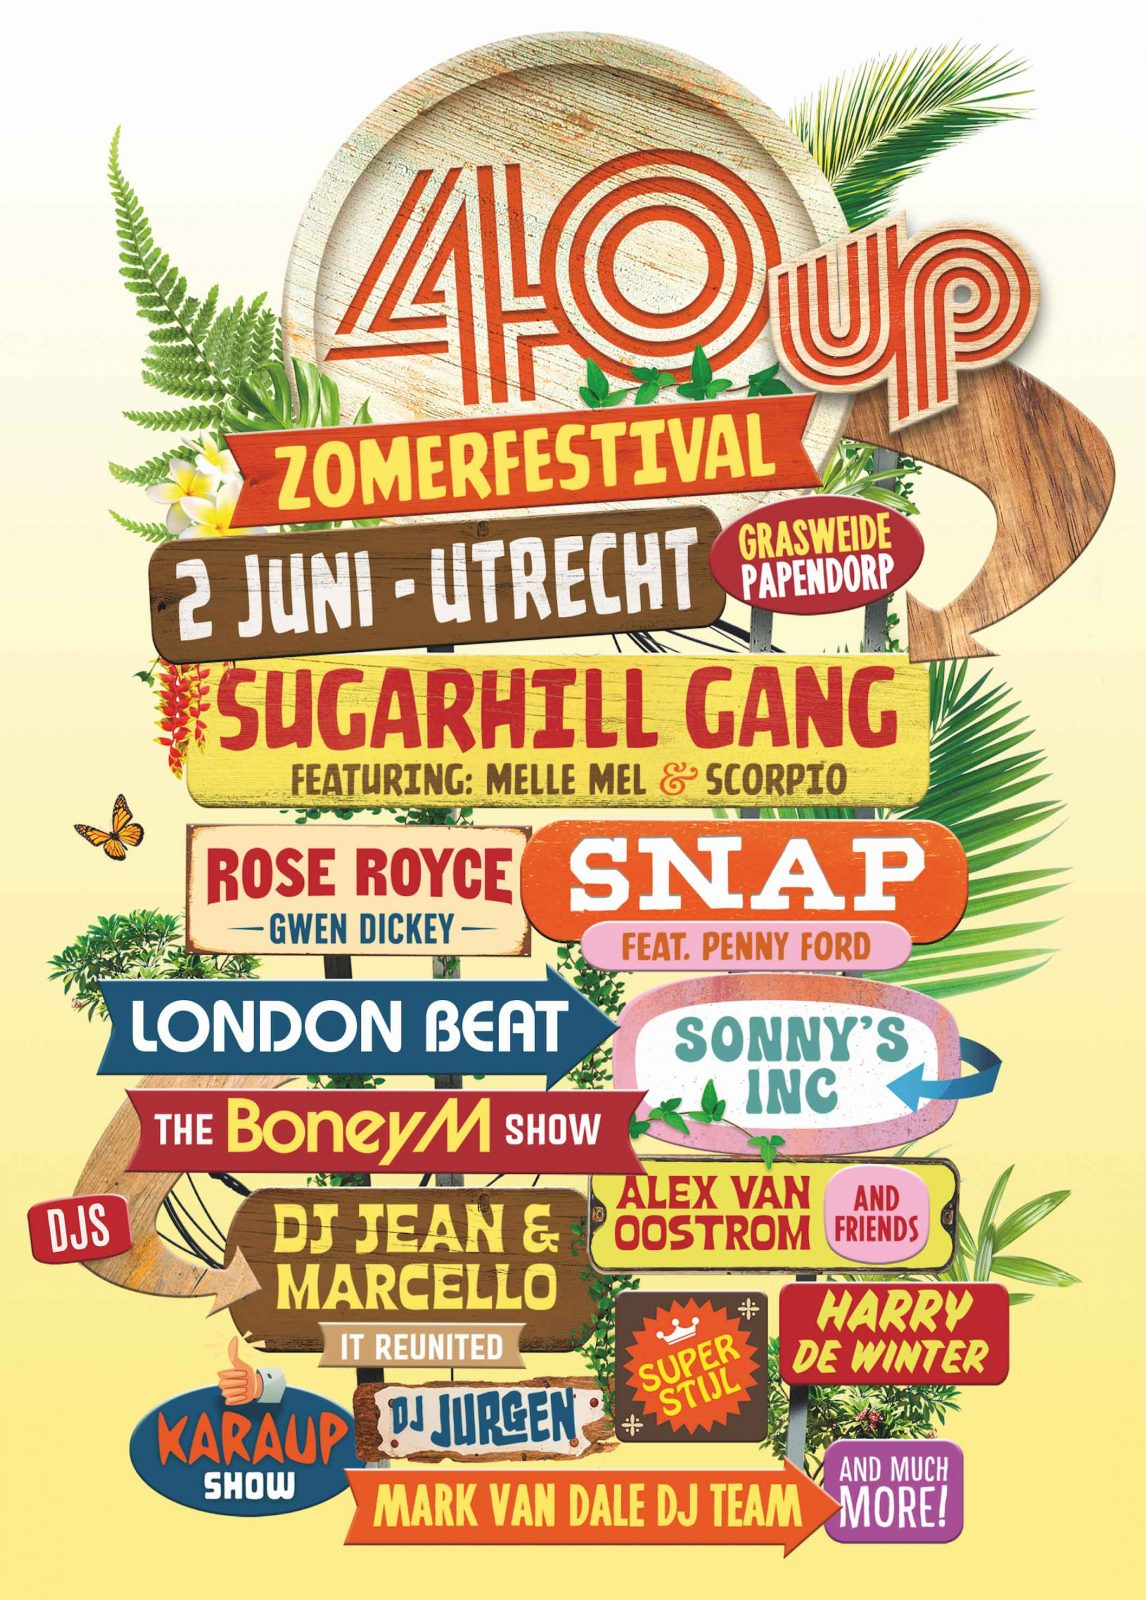 40up_festival_flyer